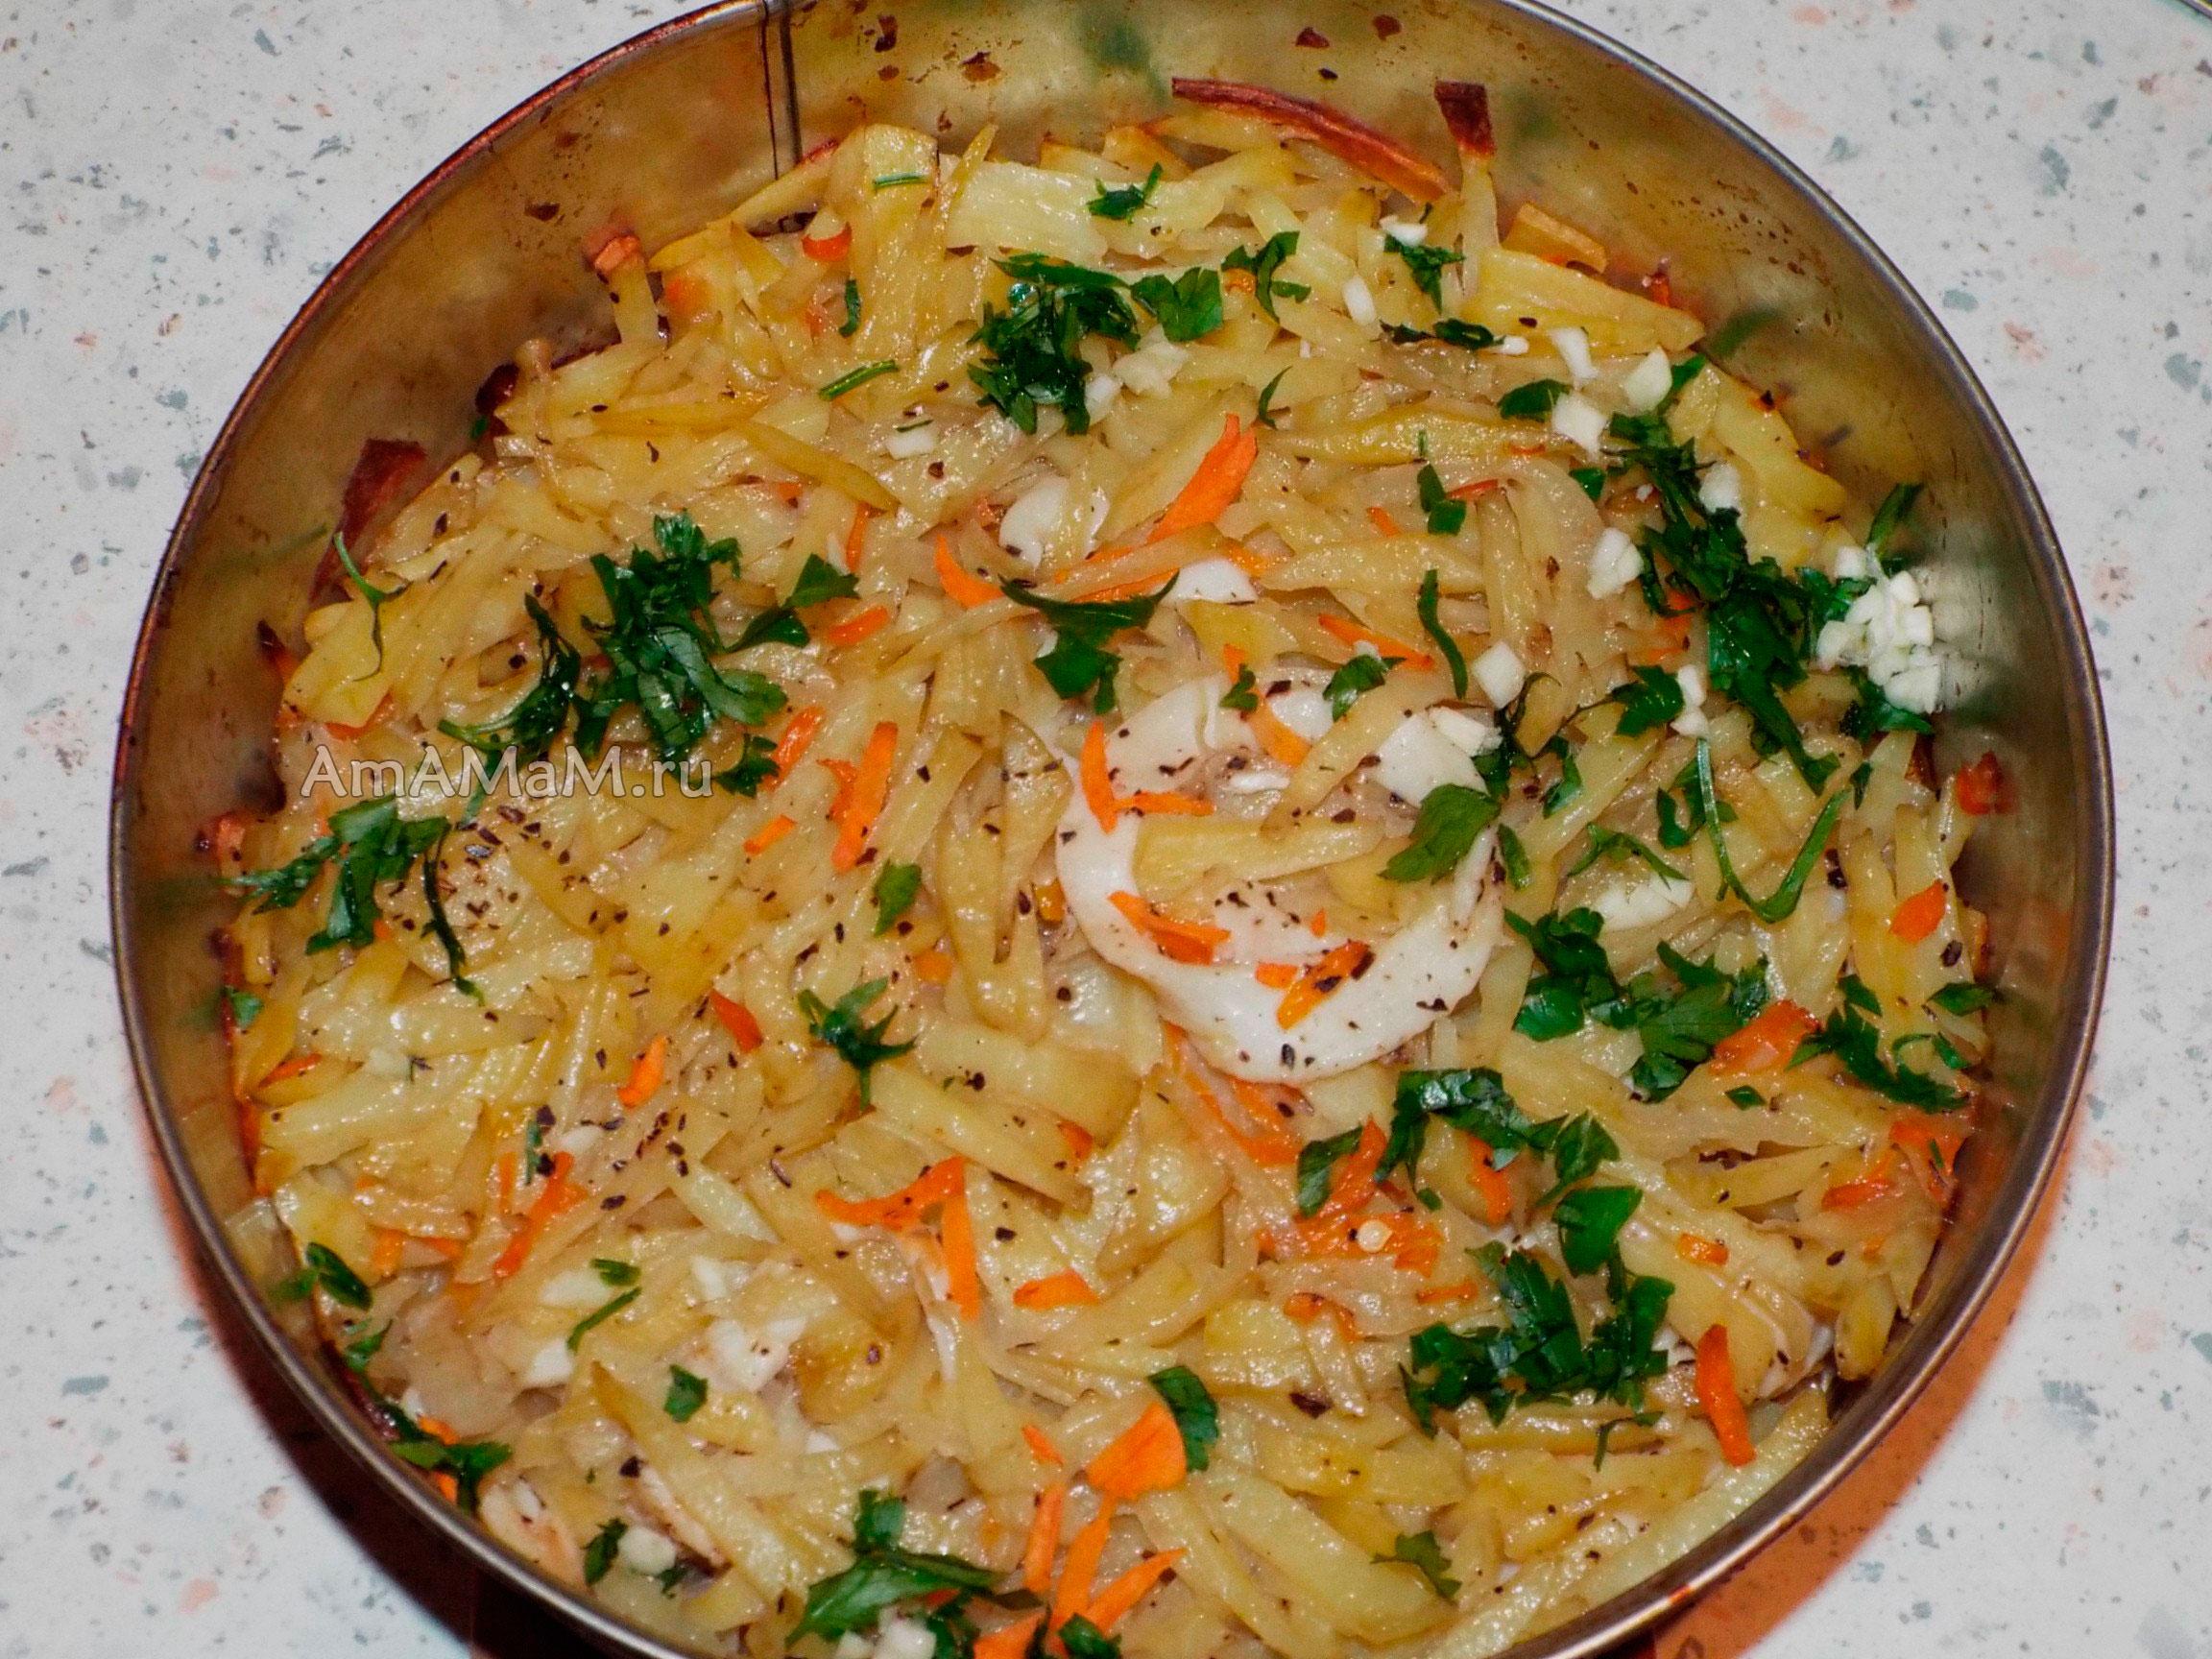 Кальмары с картофелем рецепты